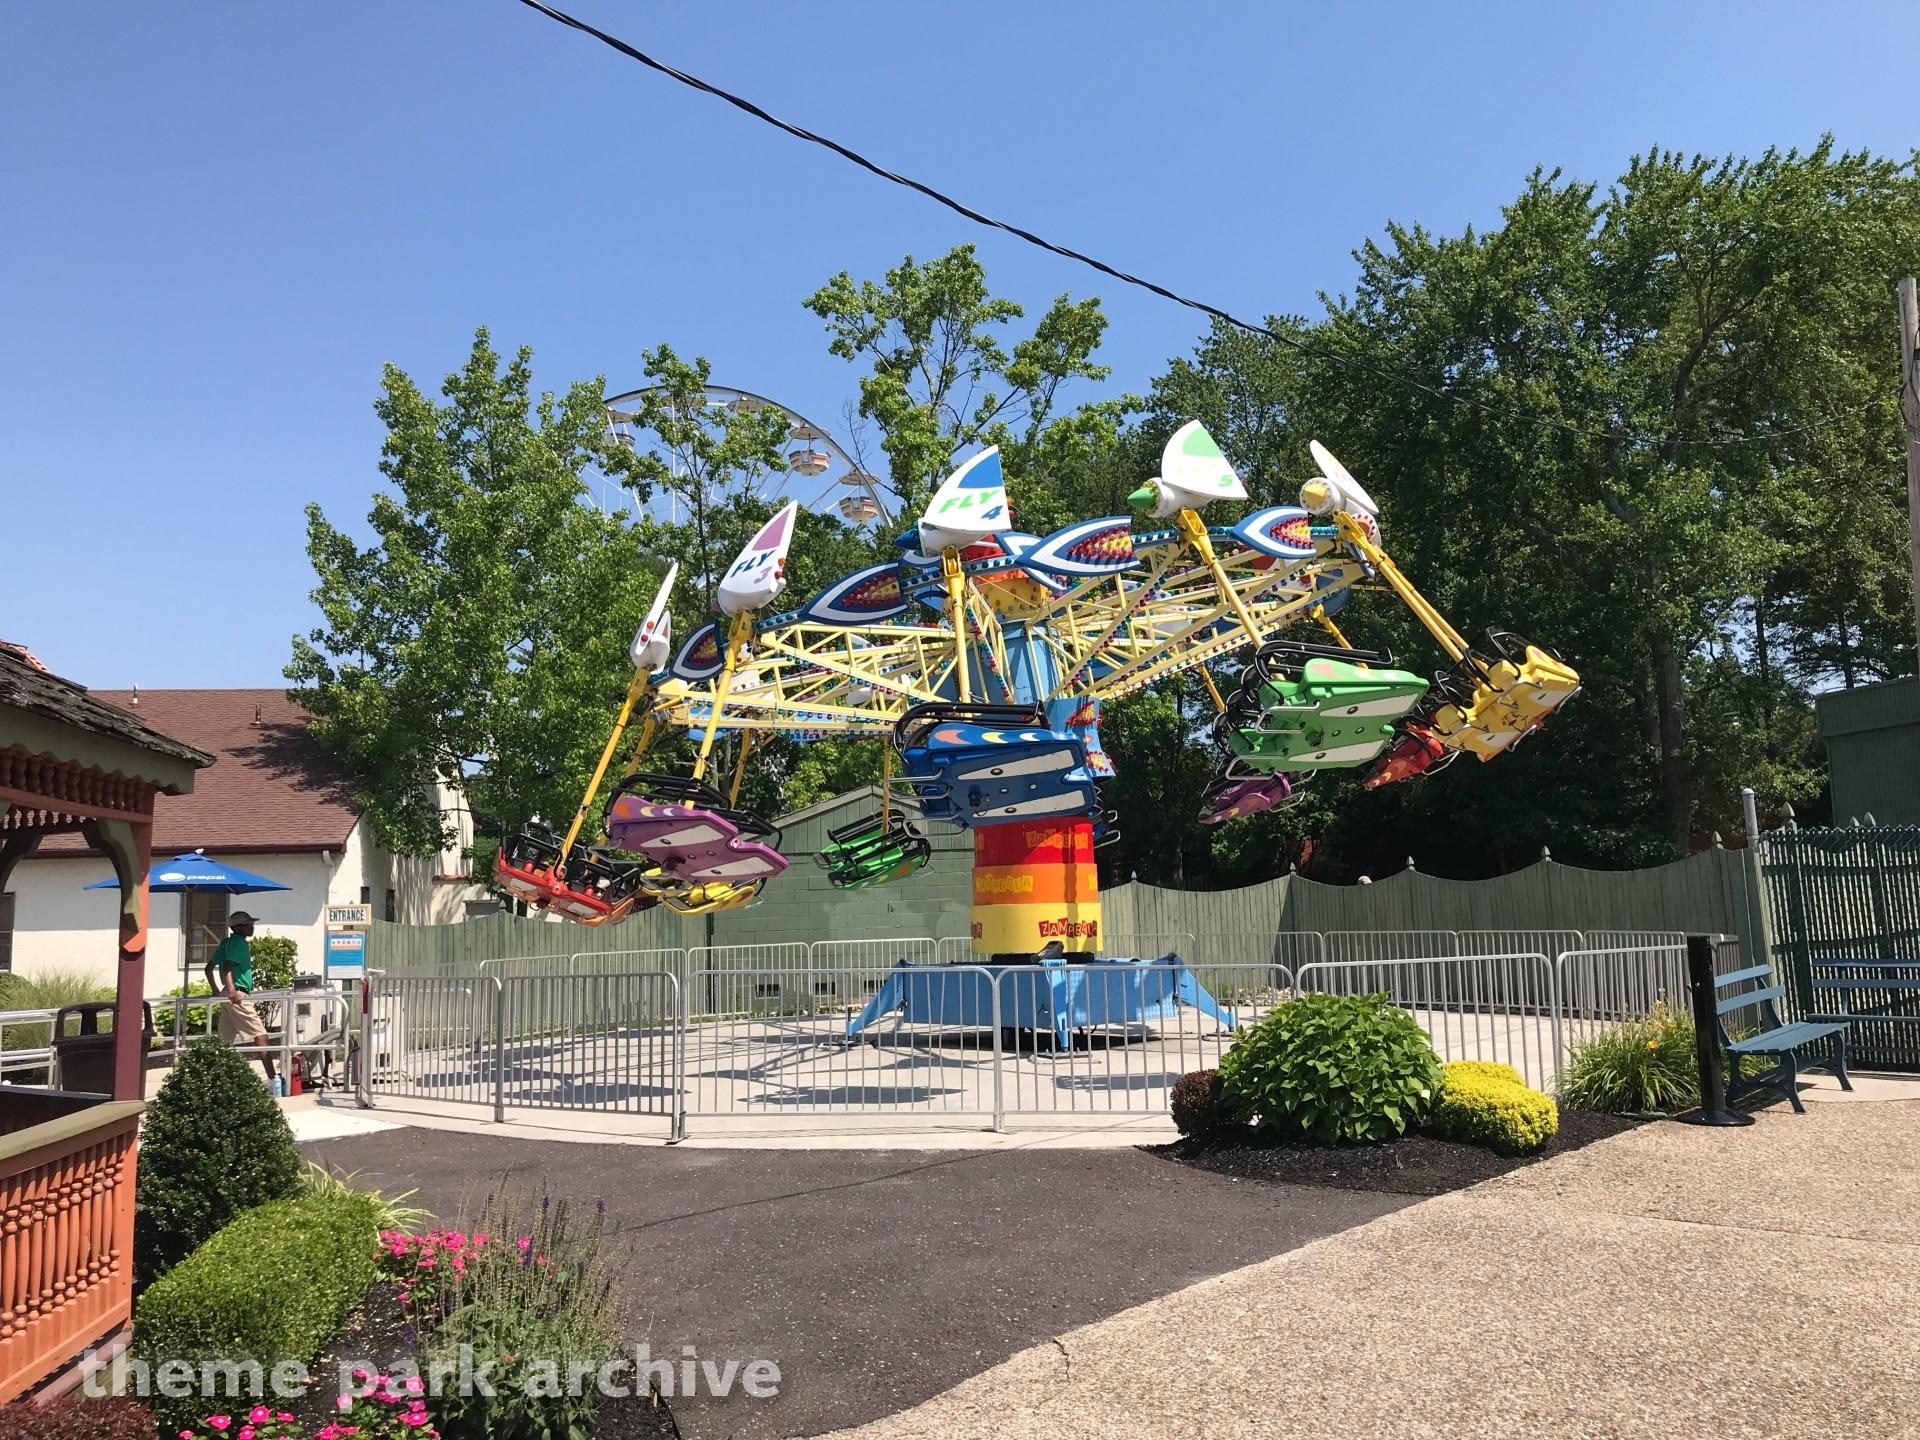 Kite Flyer at Clementon Park & Splash World